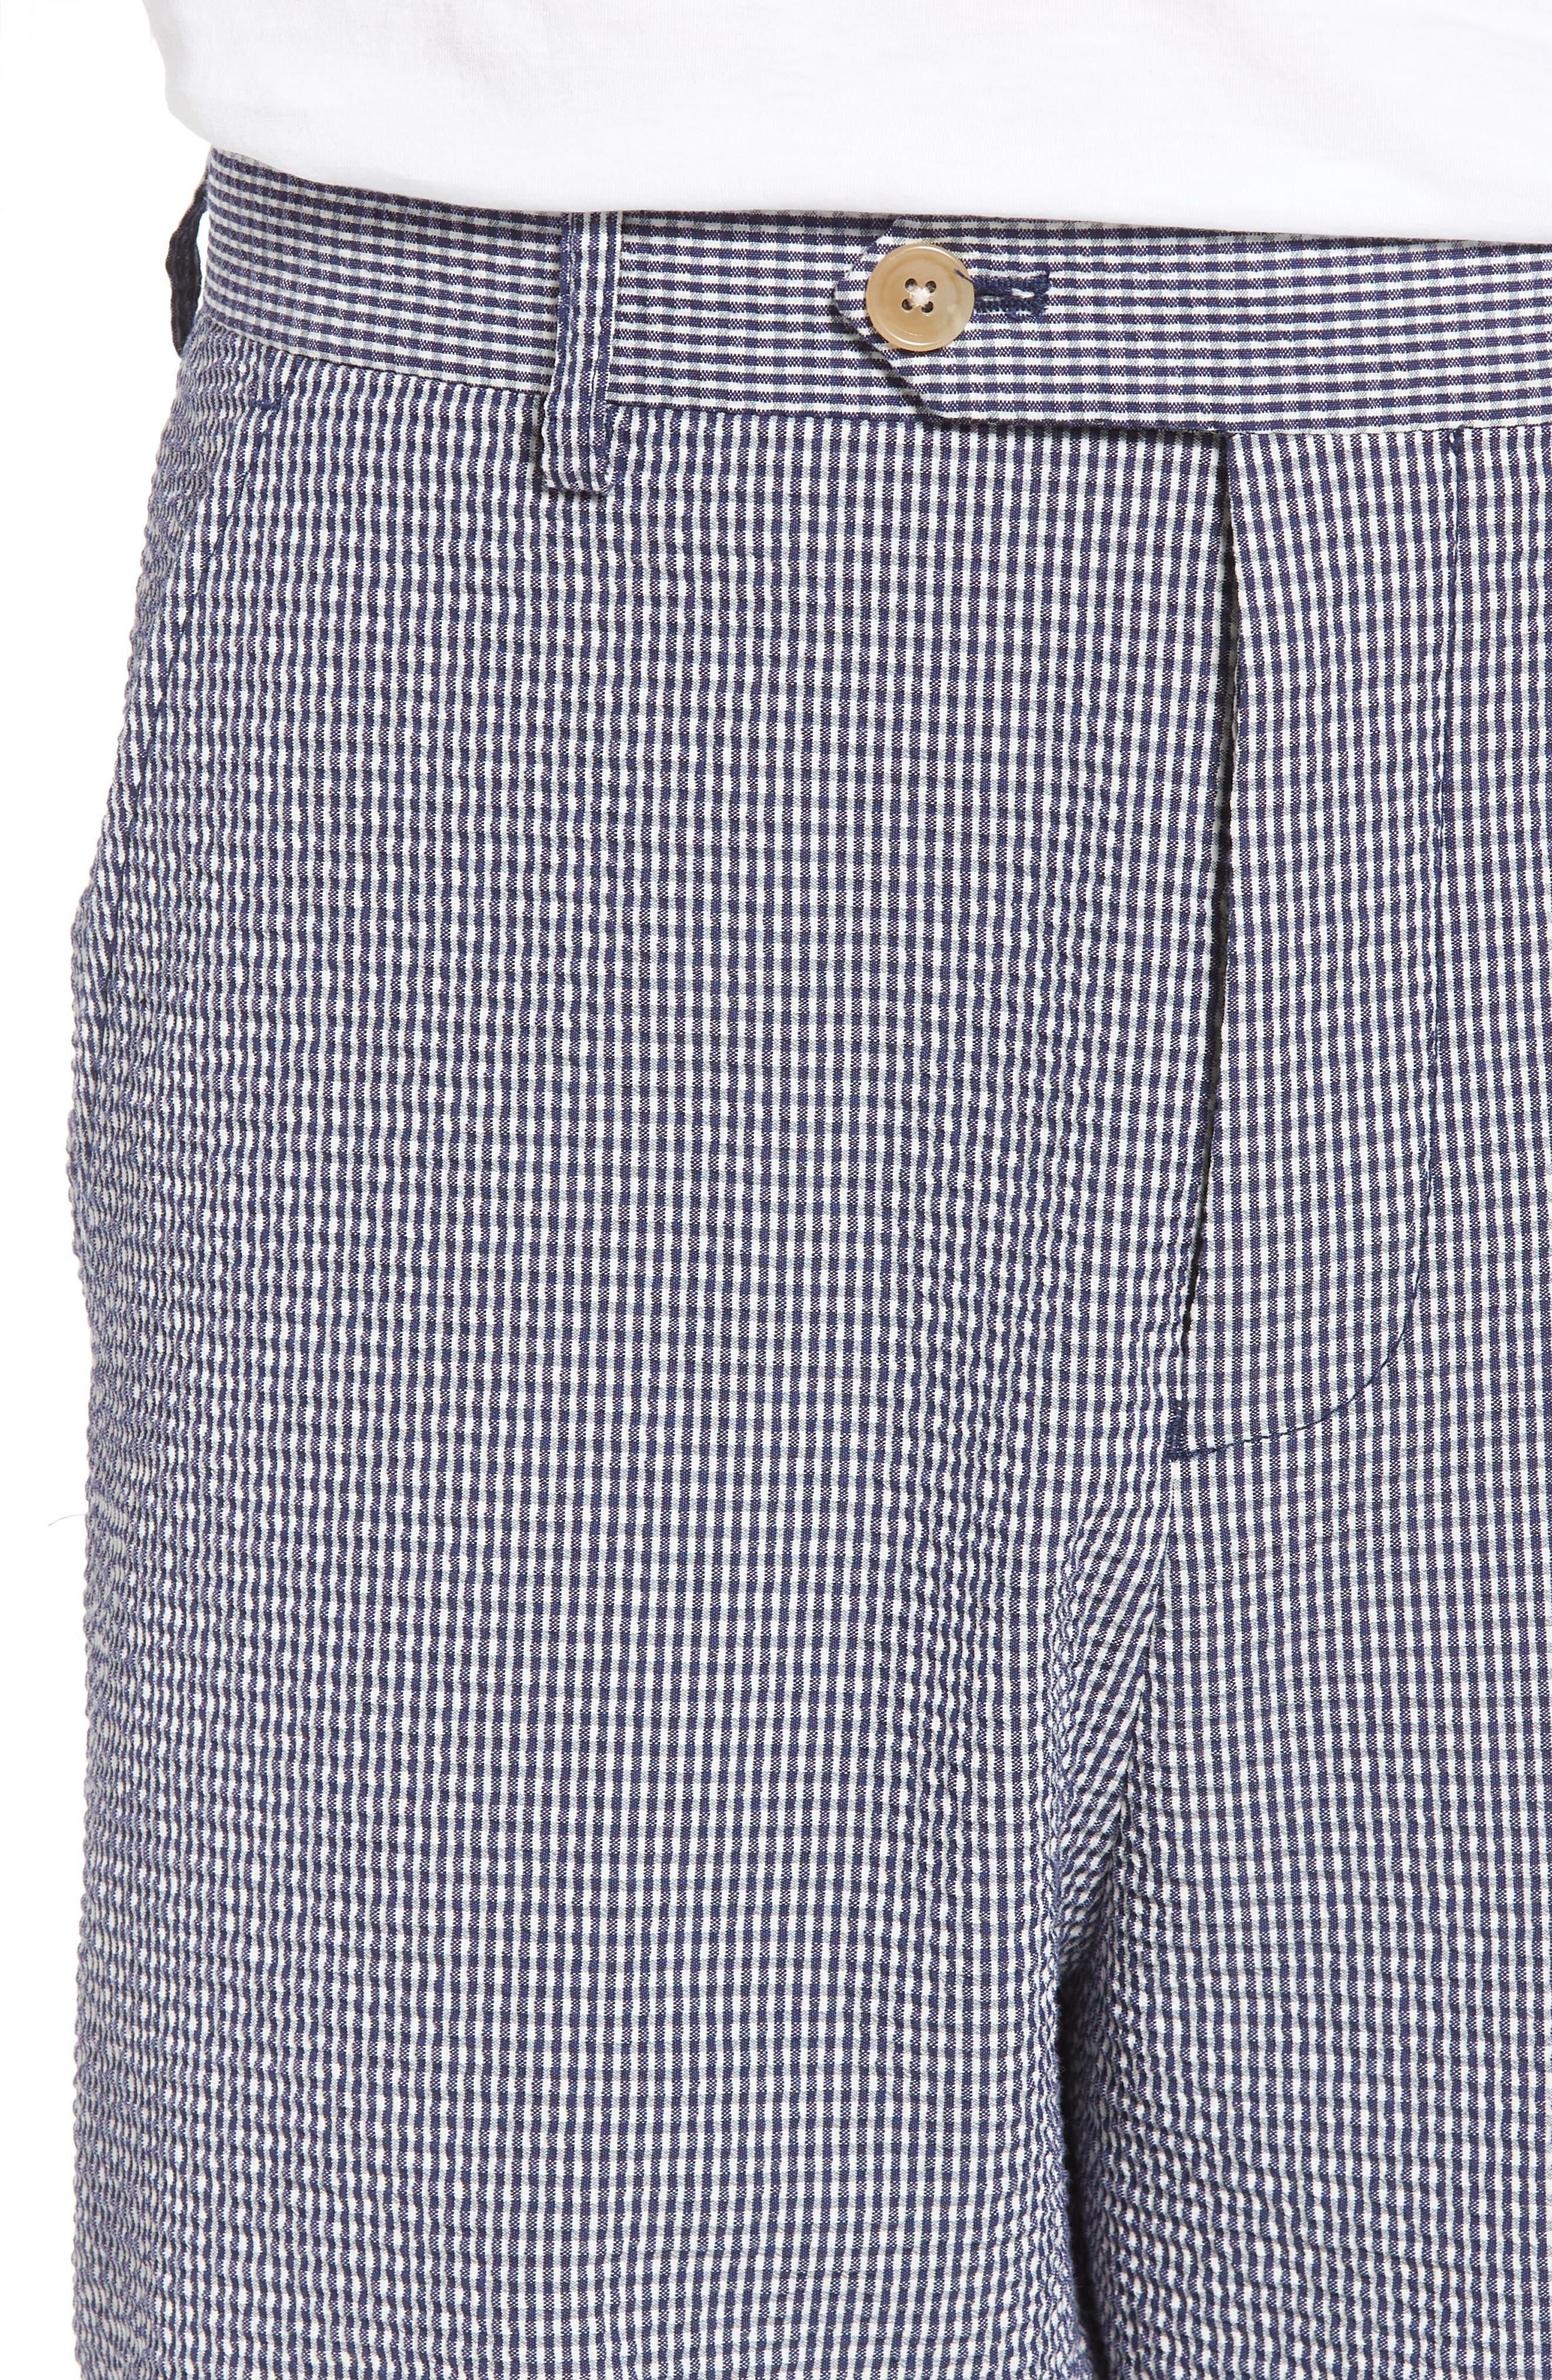 Stretch Seersucker Shorts,                             Alternate thumbnail 4, color,                             Marine Blue